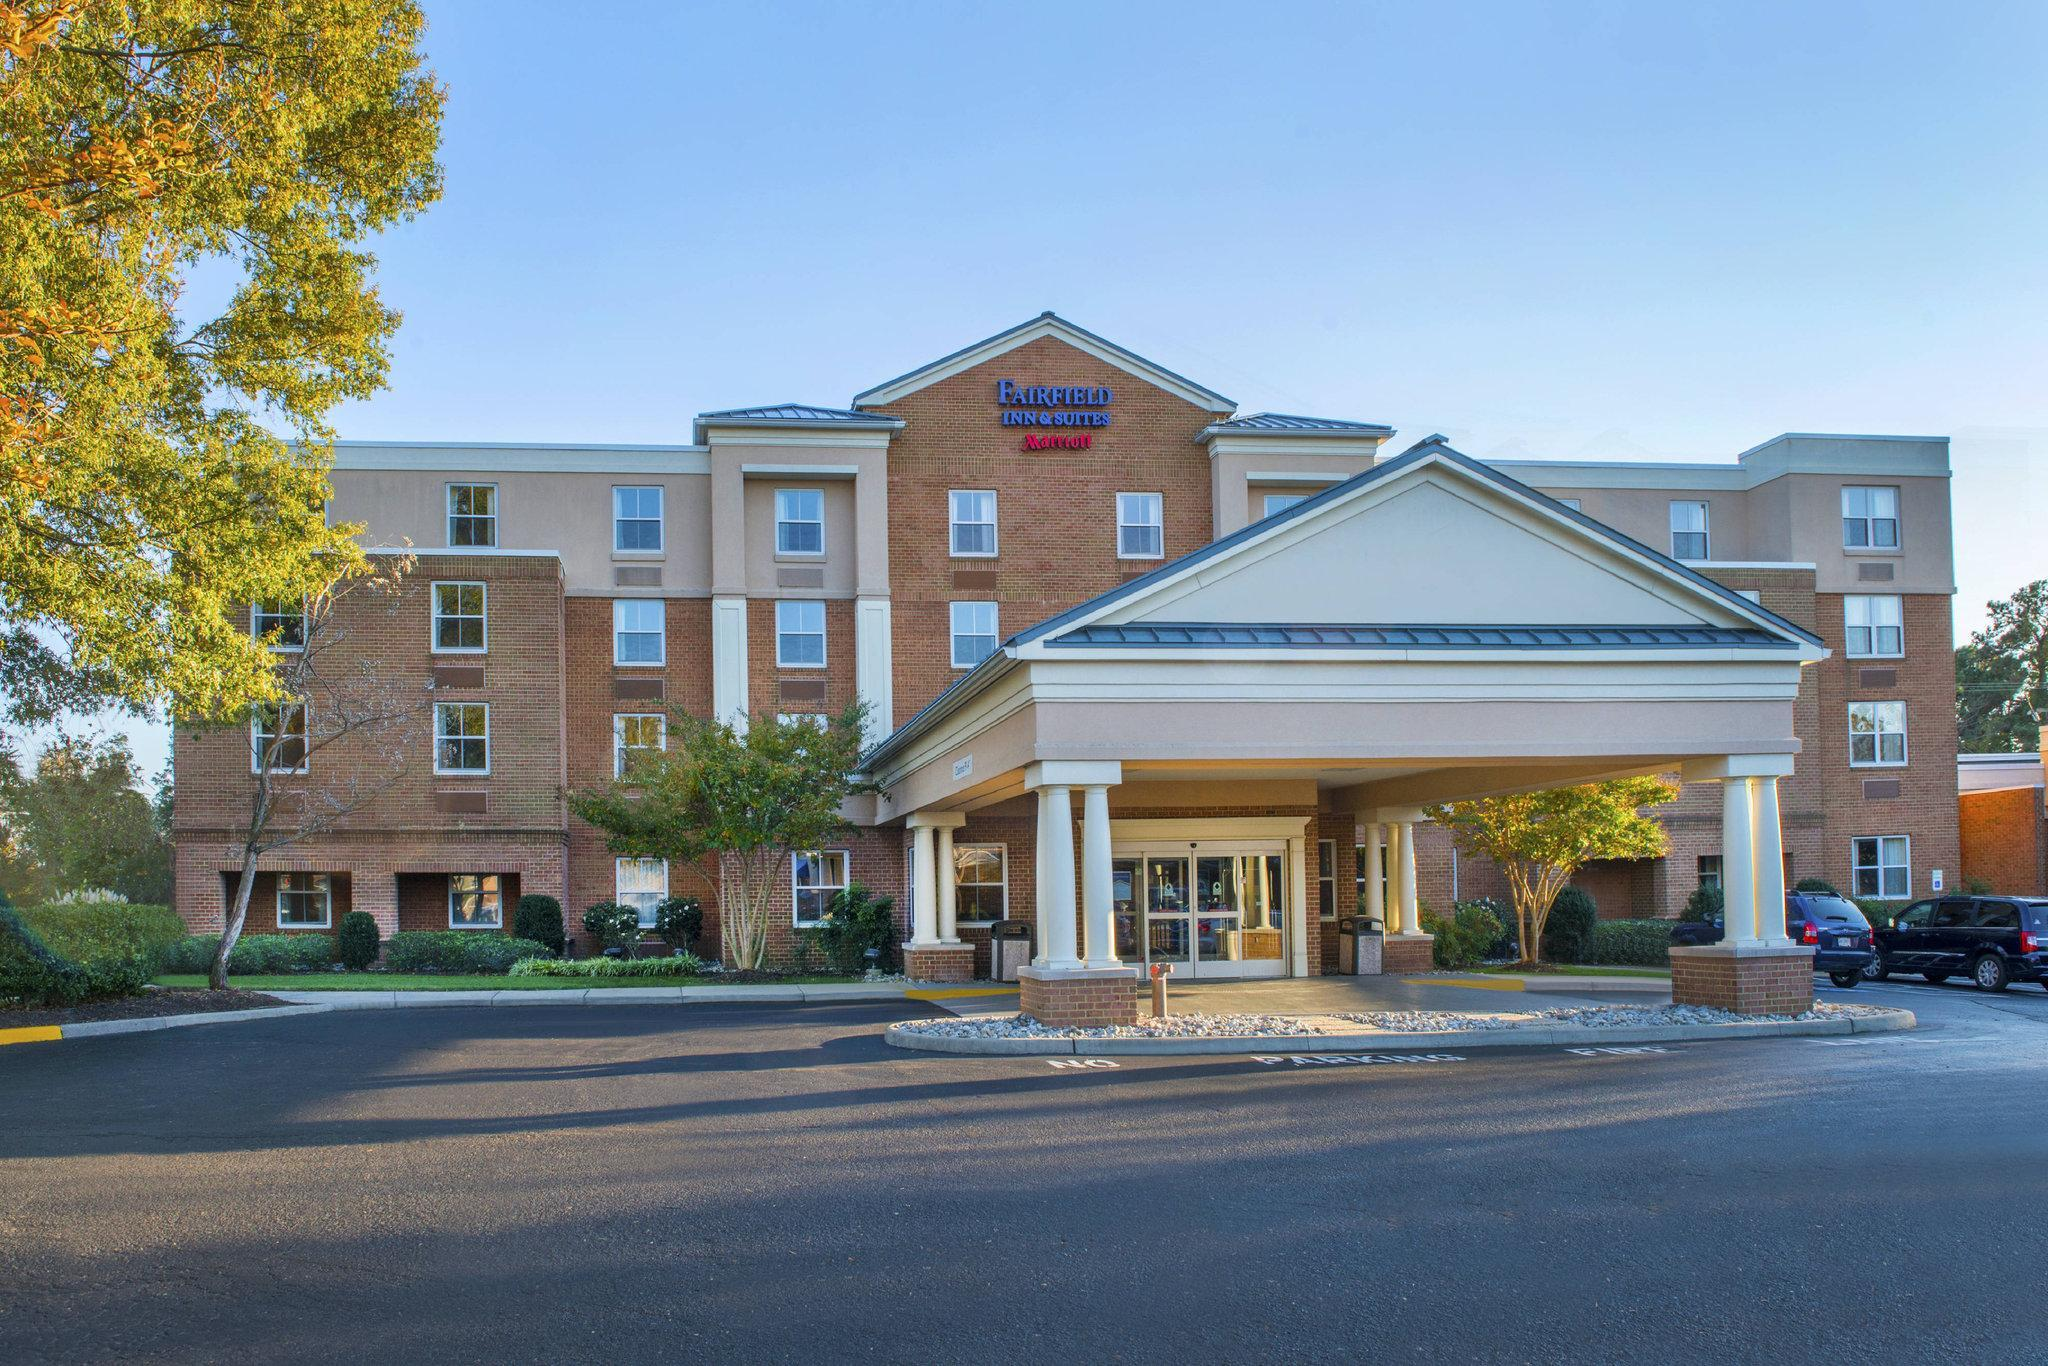 Fairfield Inn And Suites Williamsburg